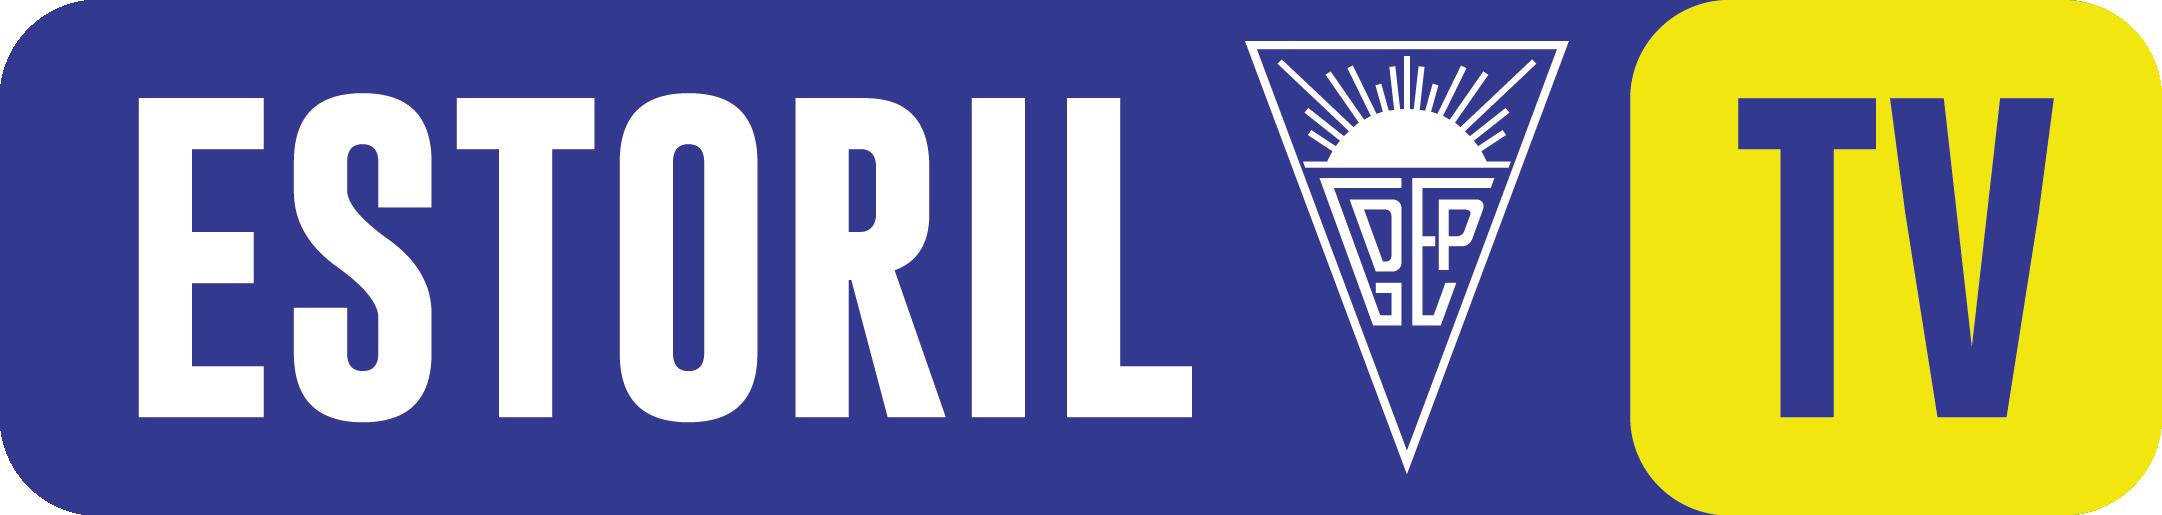 Estoril TV